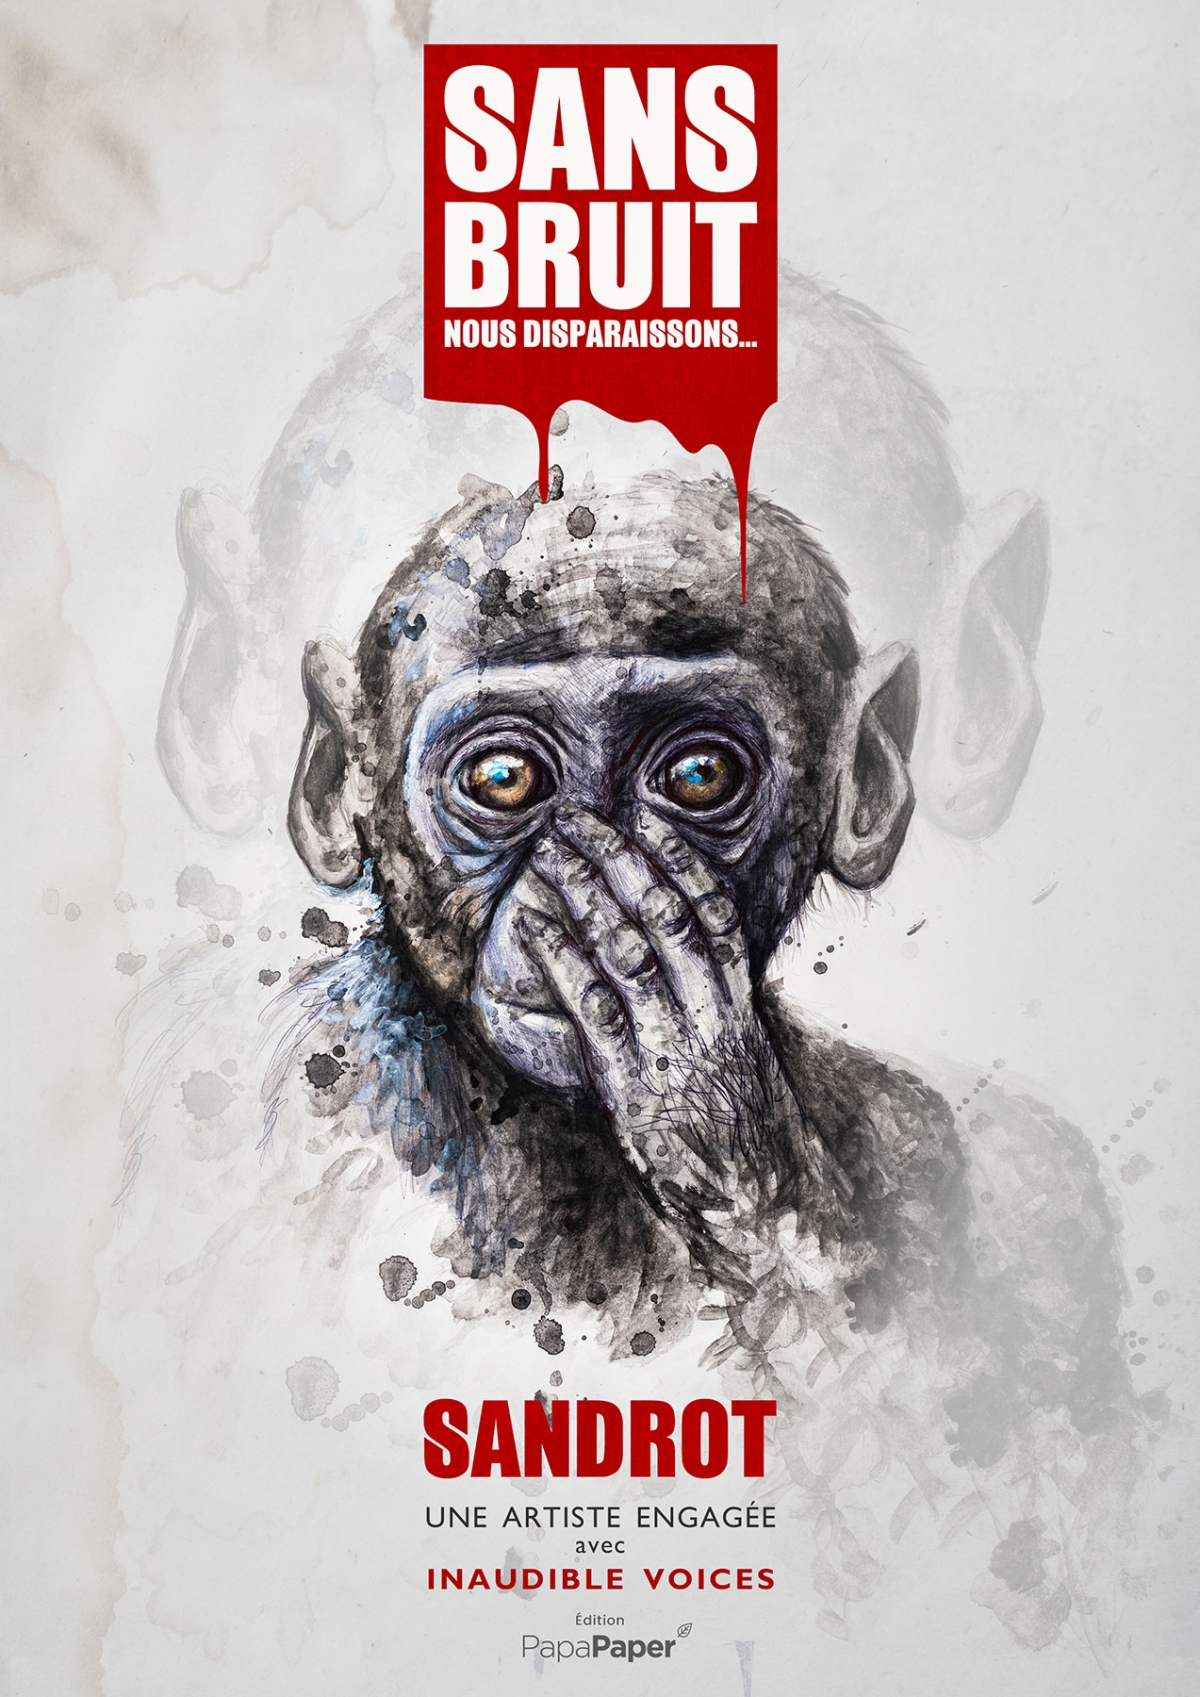 Livre Sandrot Sans bruit Inaudible Voices Free Spirit